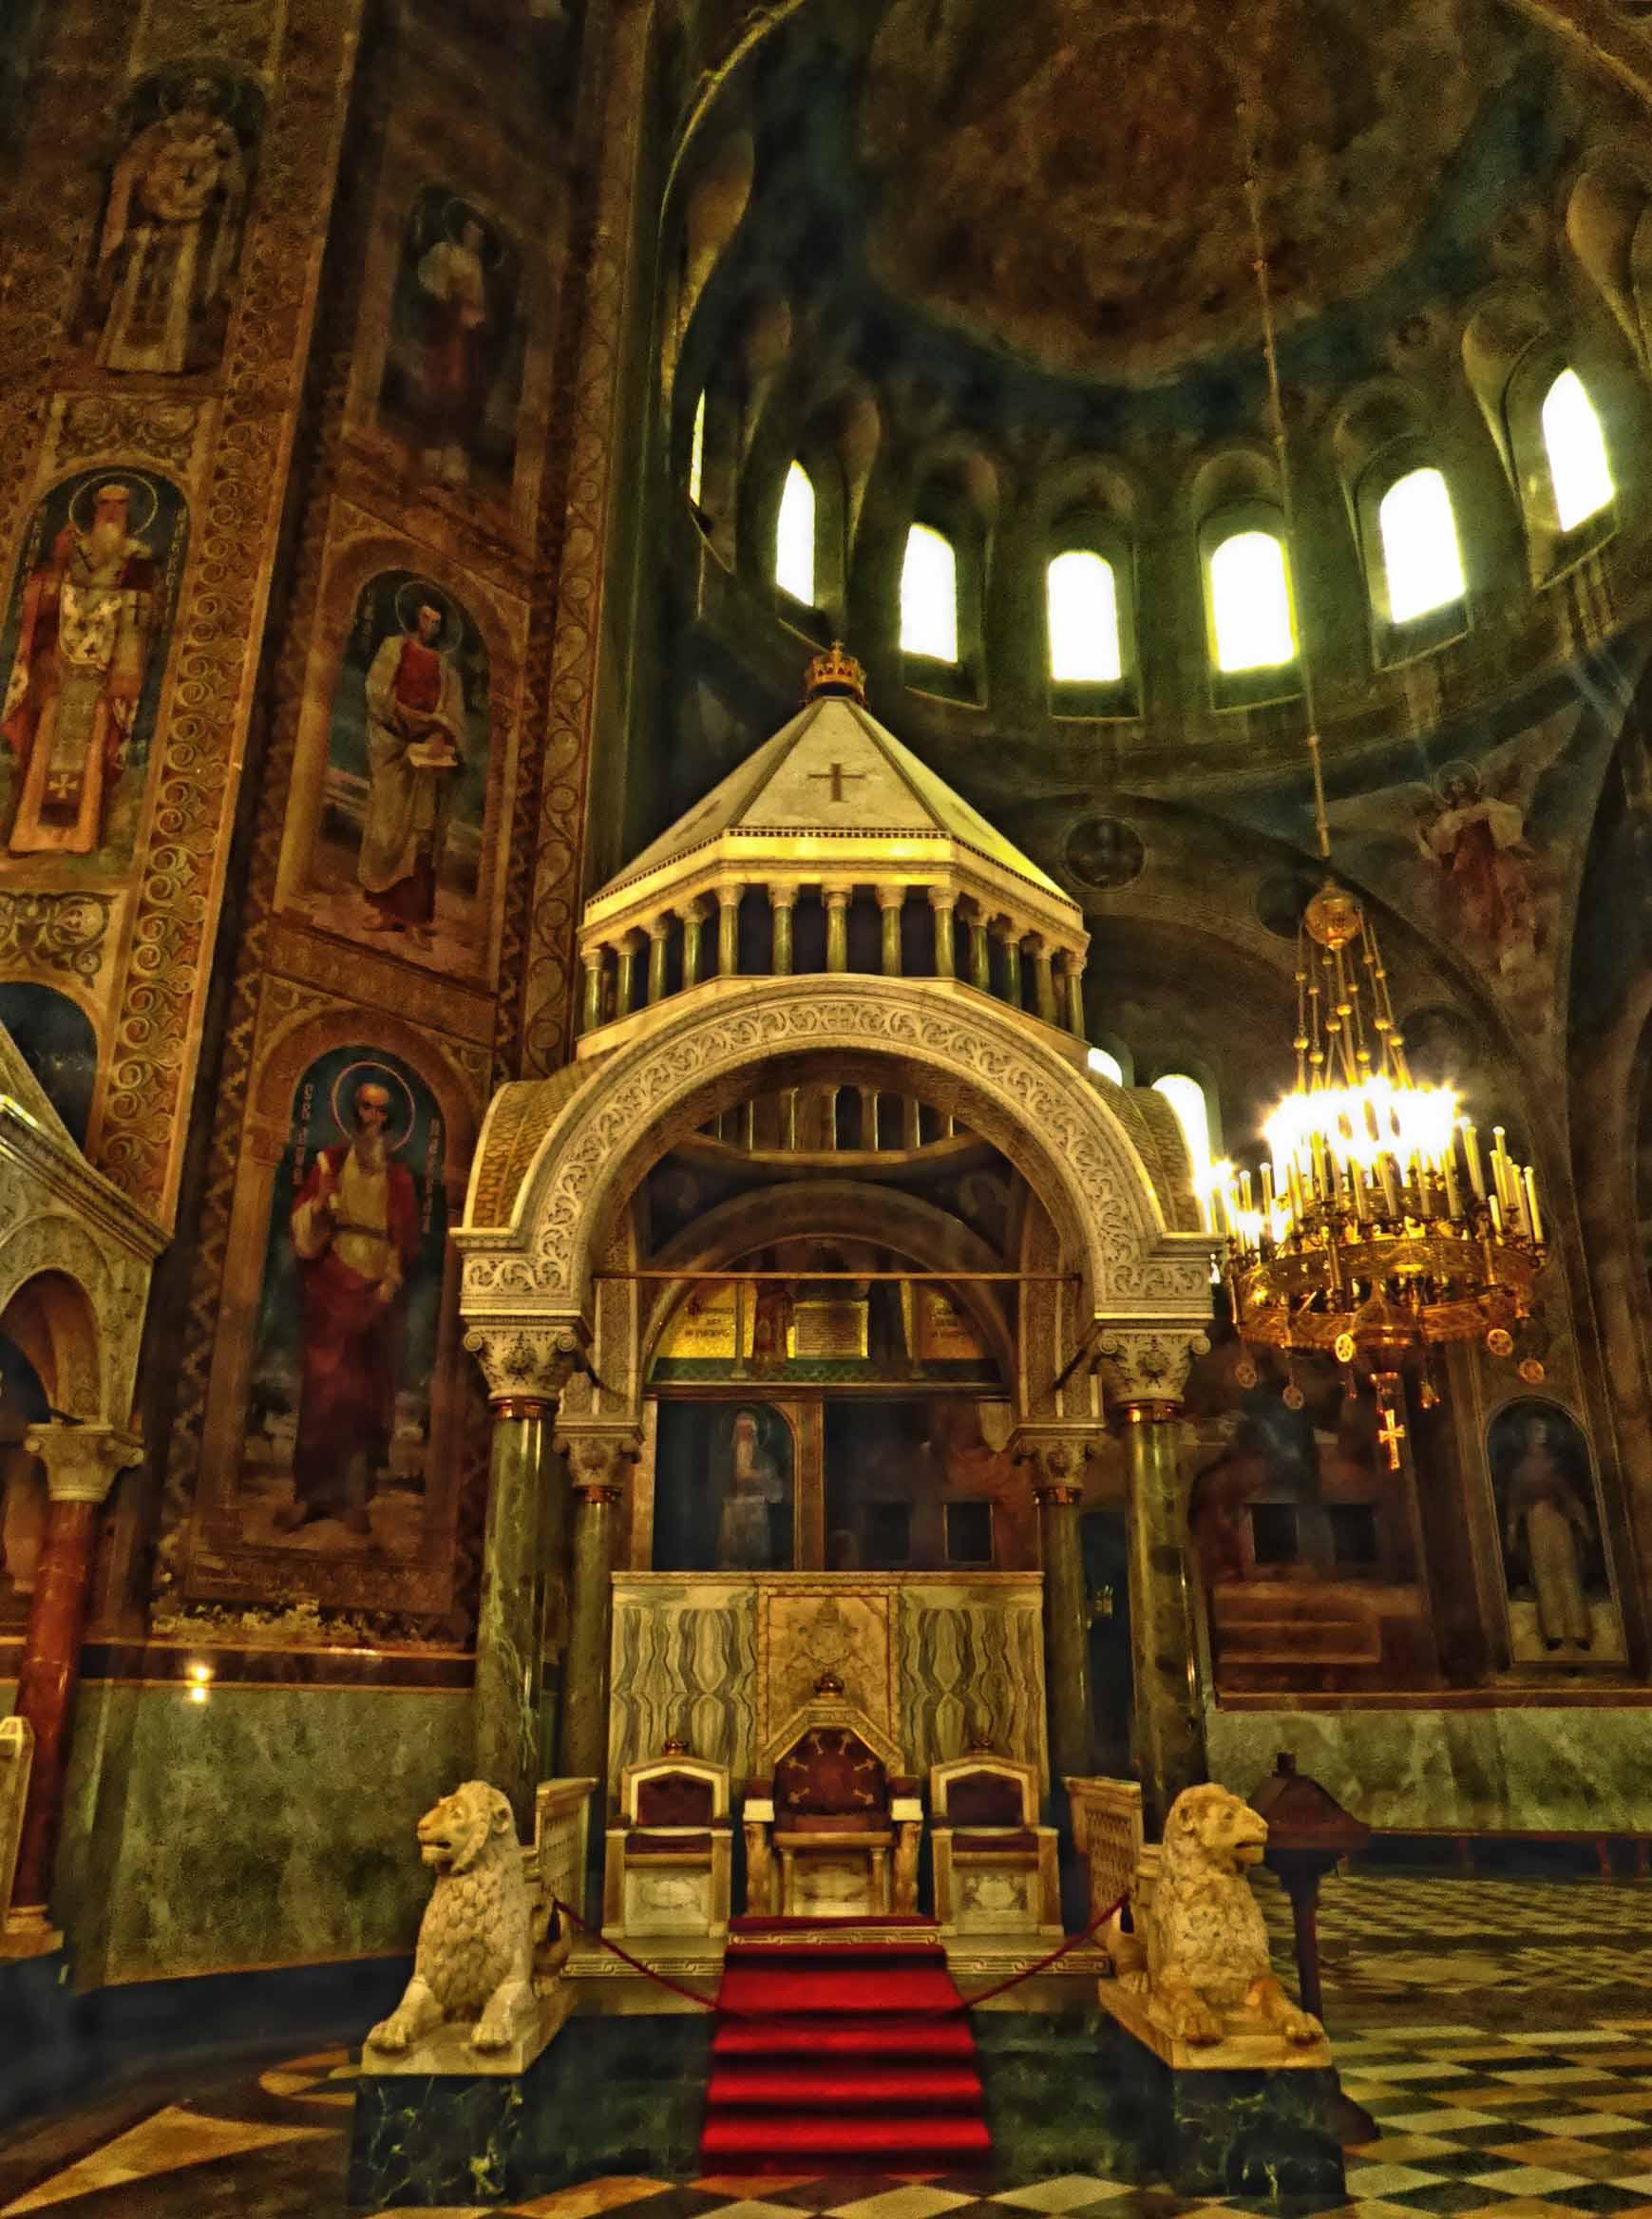 Dark interior of Orthodox cathedral